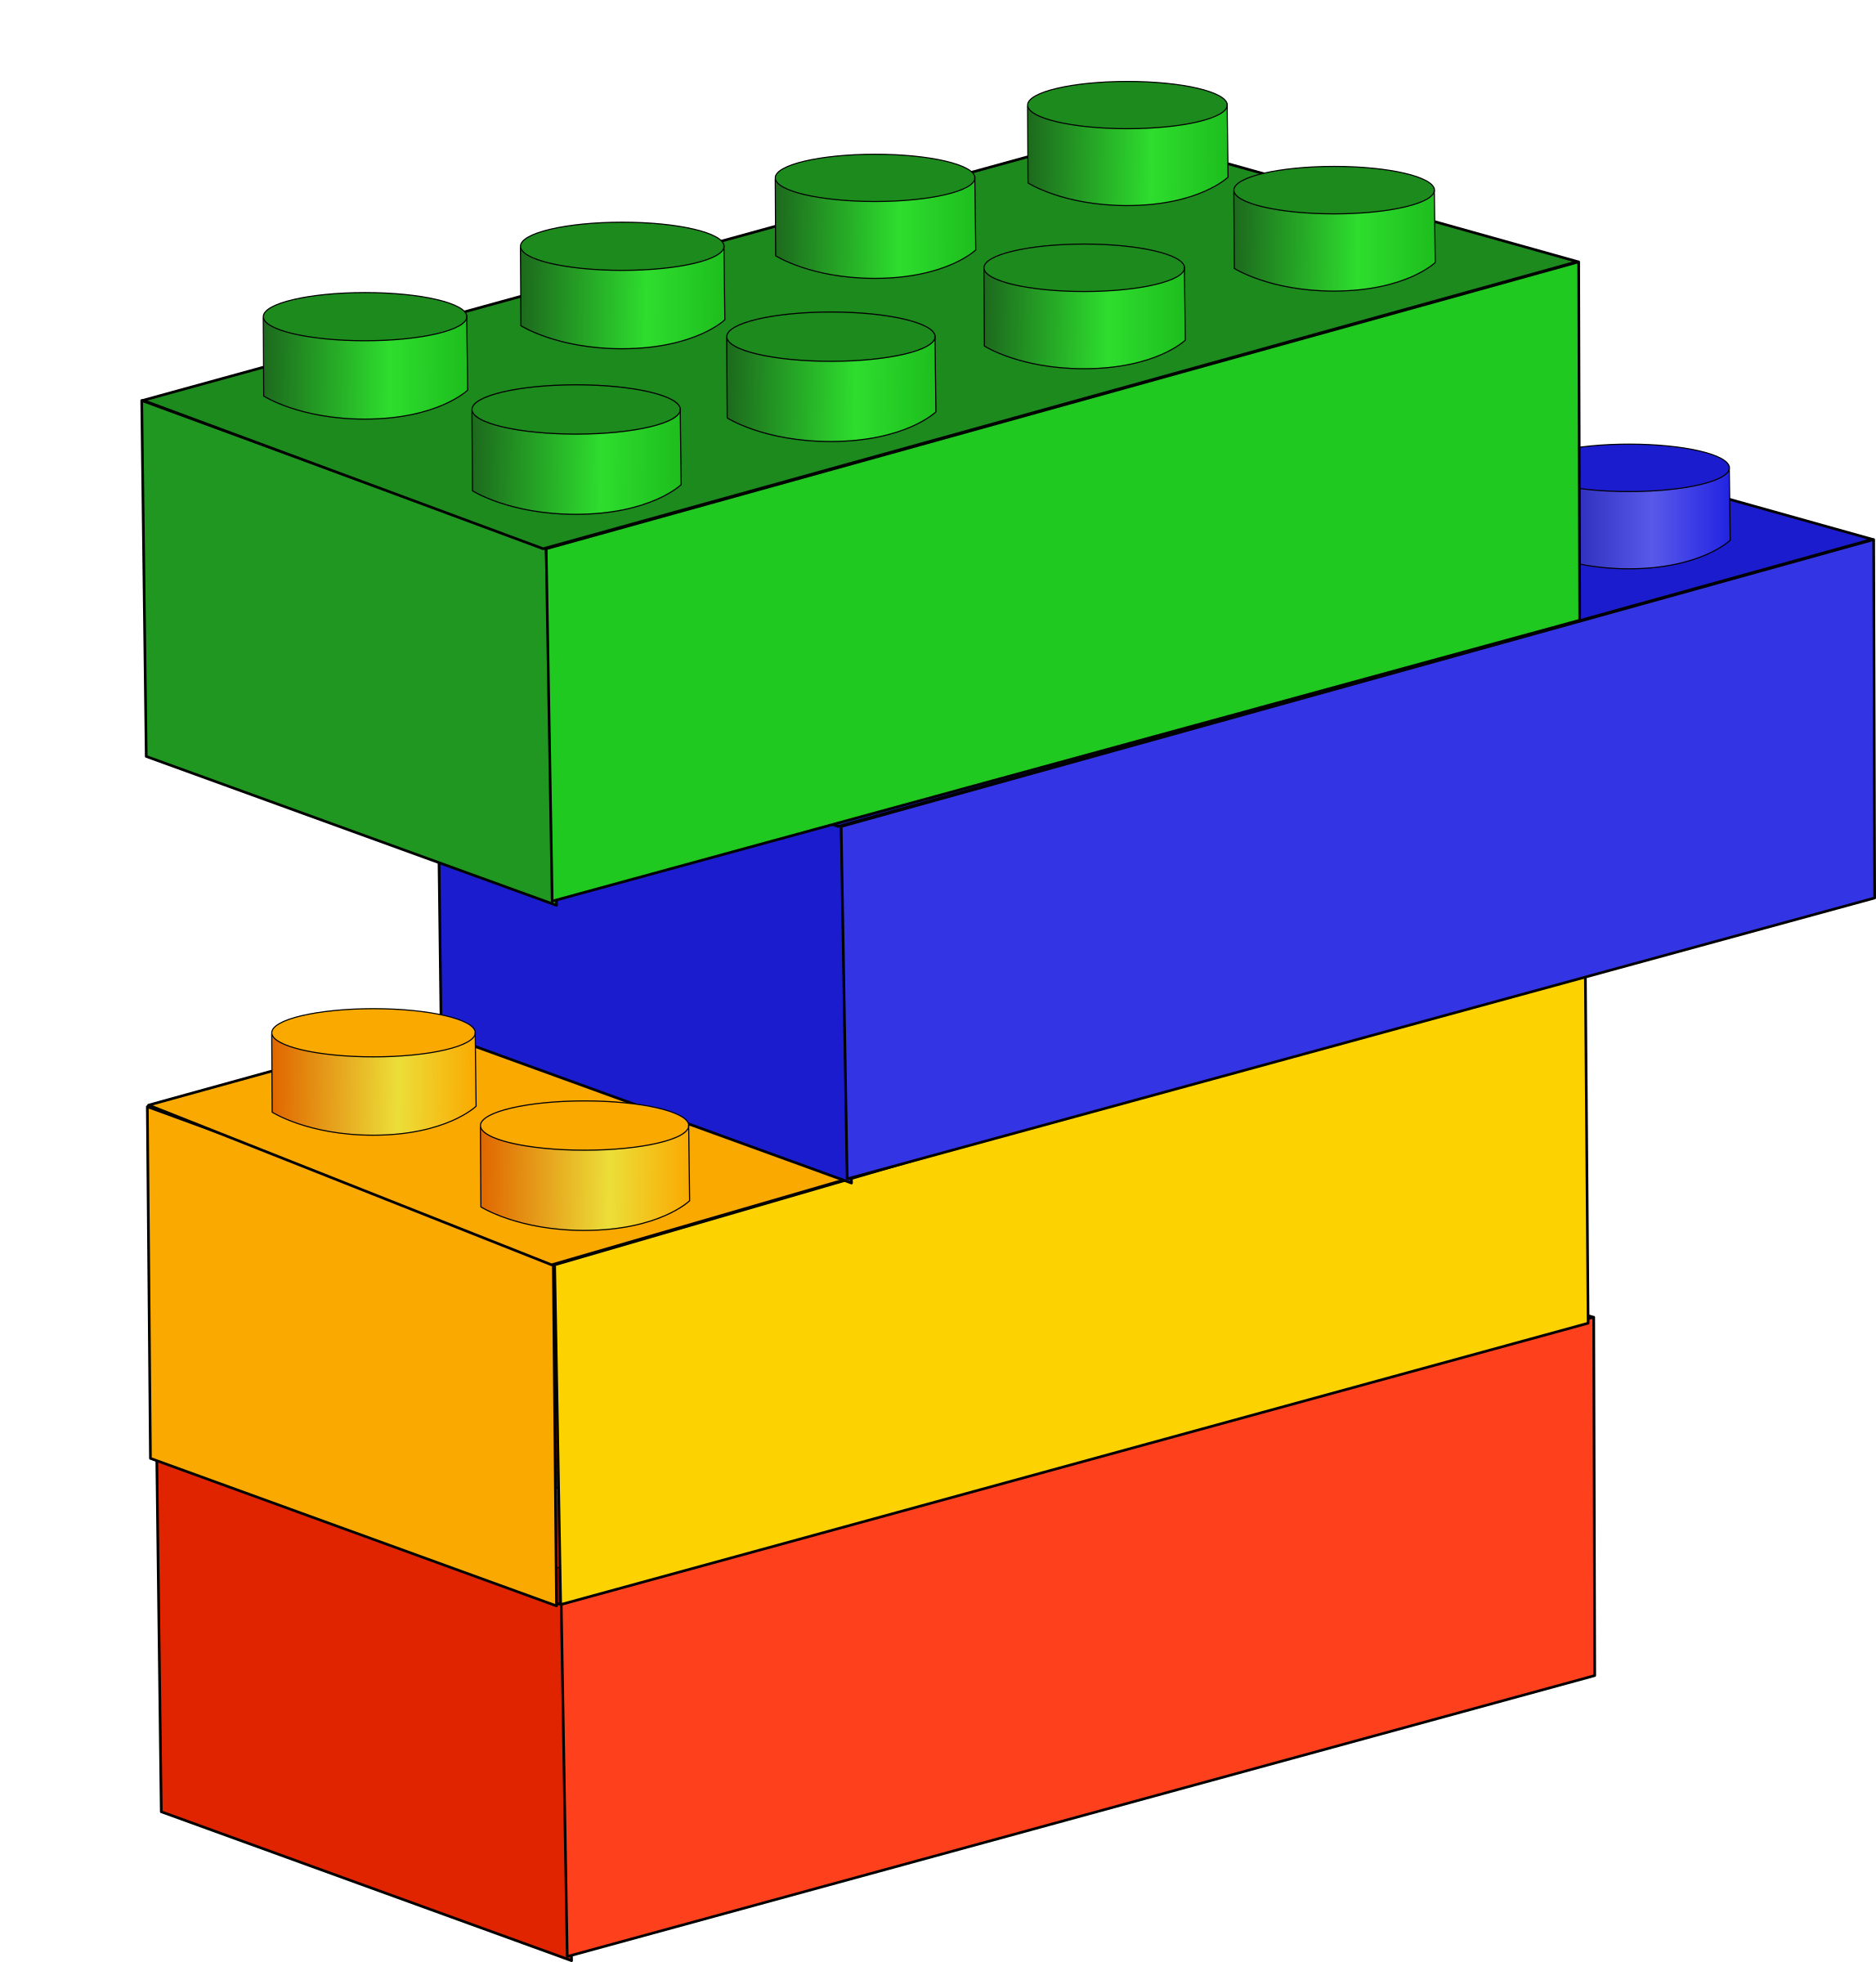 Building Blocks Of Art : Building blocks clipart suggest